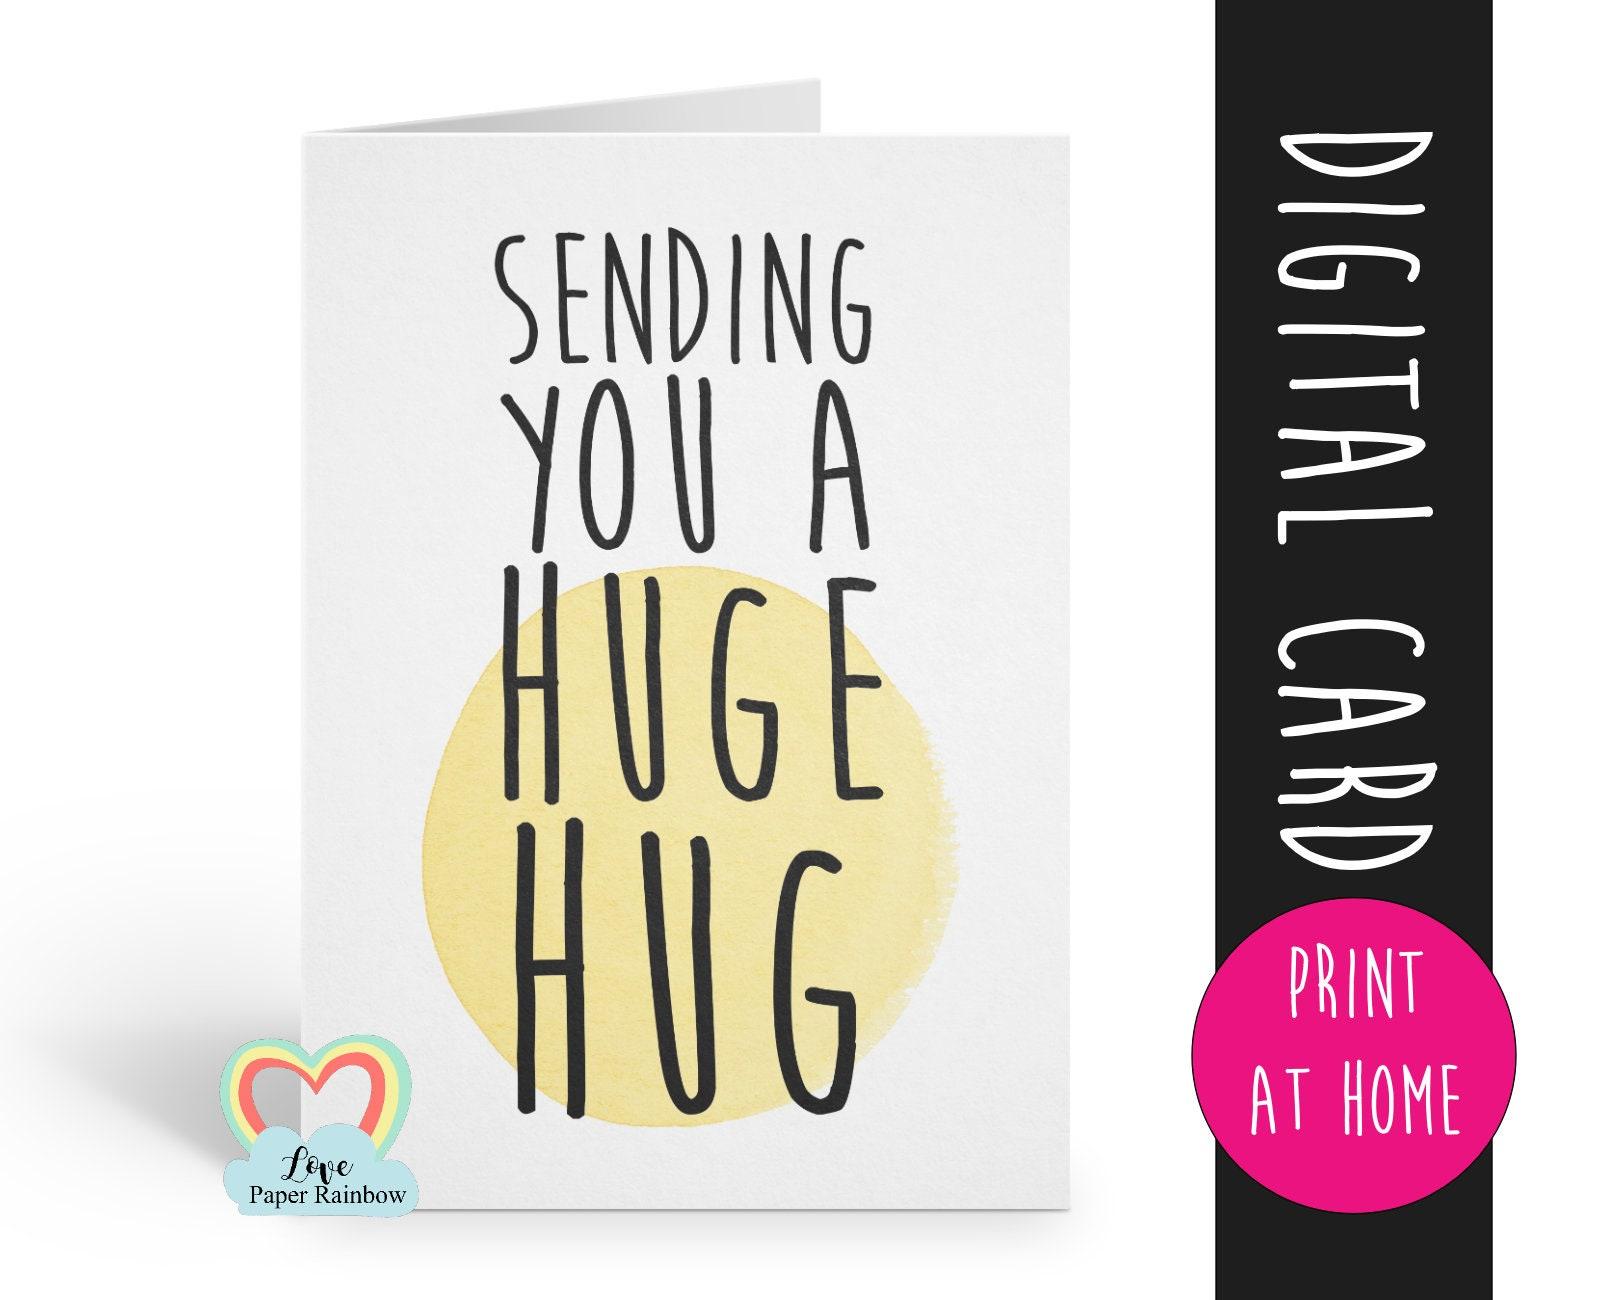 photograph regarding Printable Sympathy Card named PRINTABLE sympathy card, sending oneself a massive hug, inside